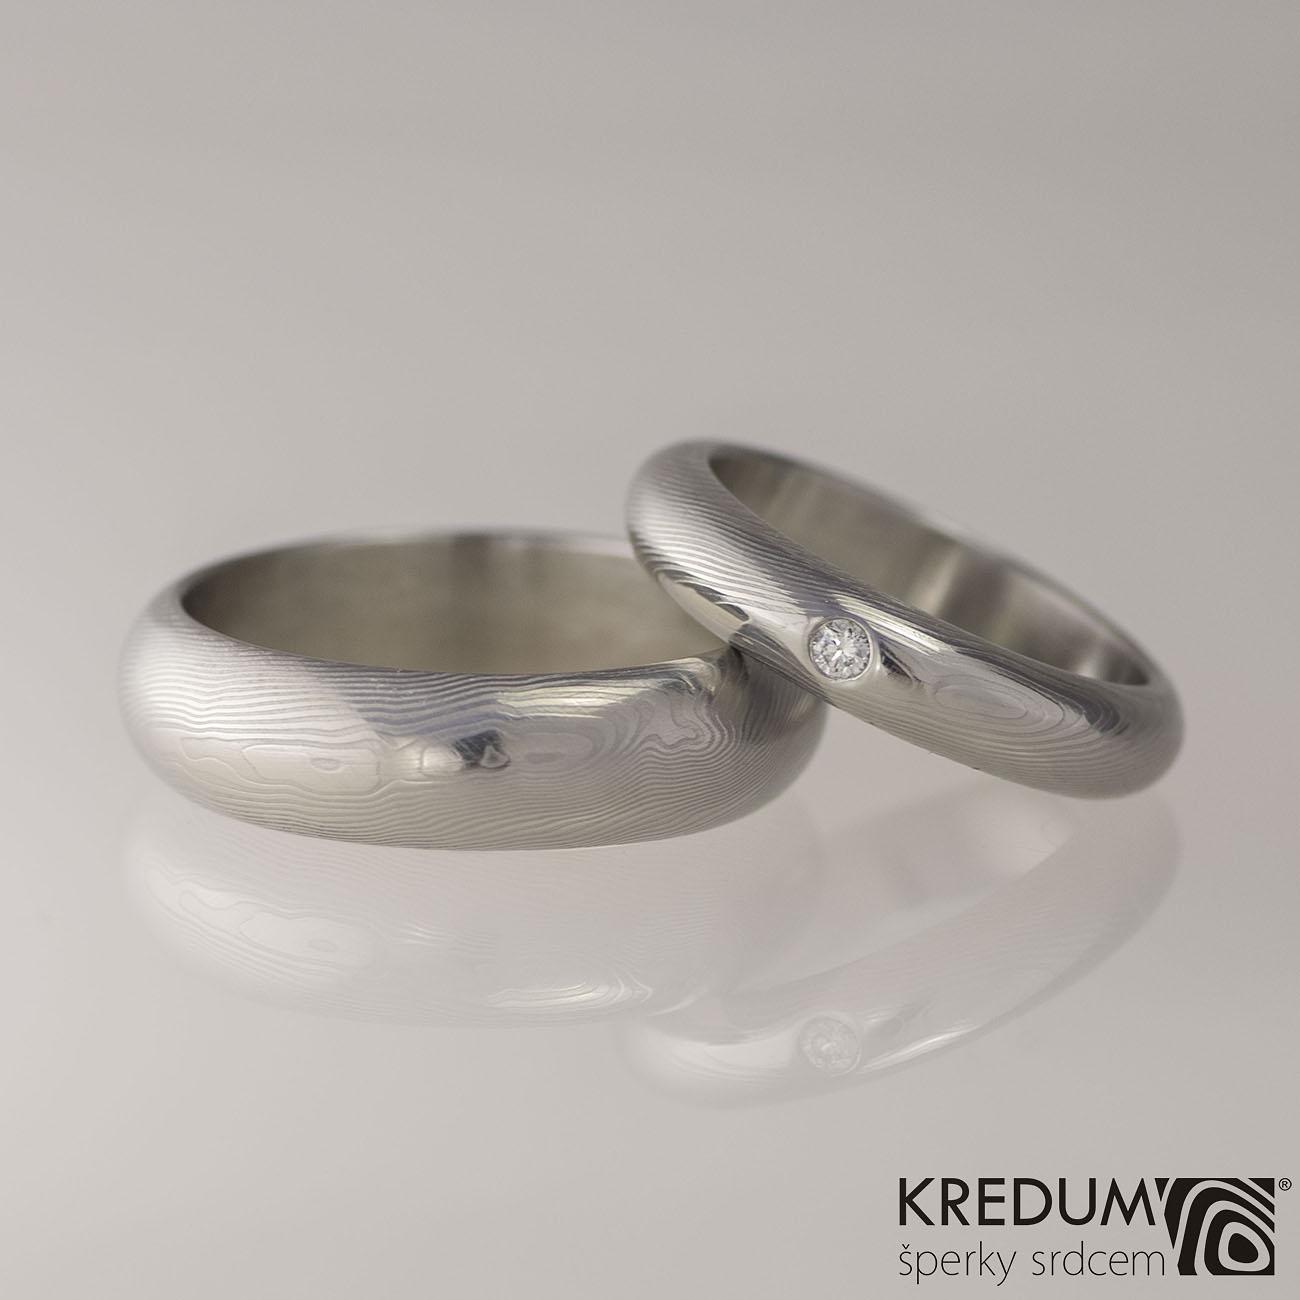 Snubni Prsteny Damasteel Prima Diamant 2 0mm Par Snubniprsteny4u Cz